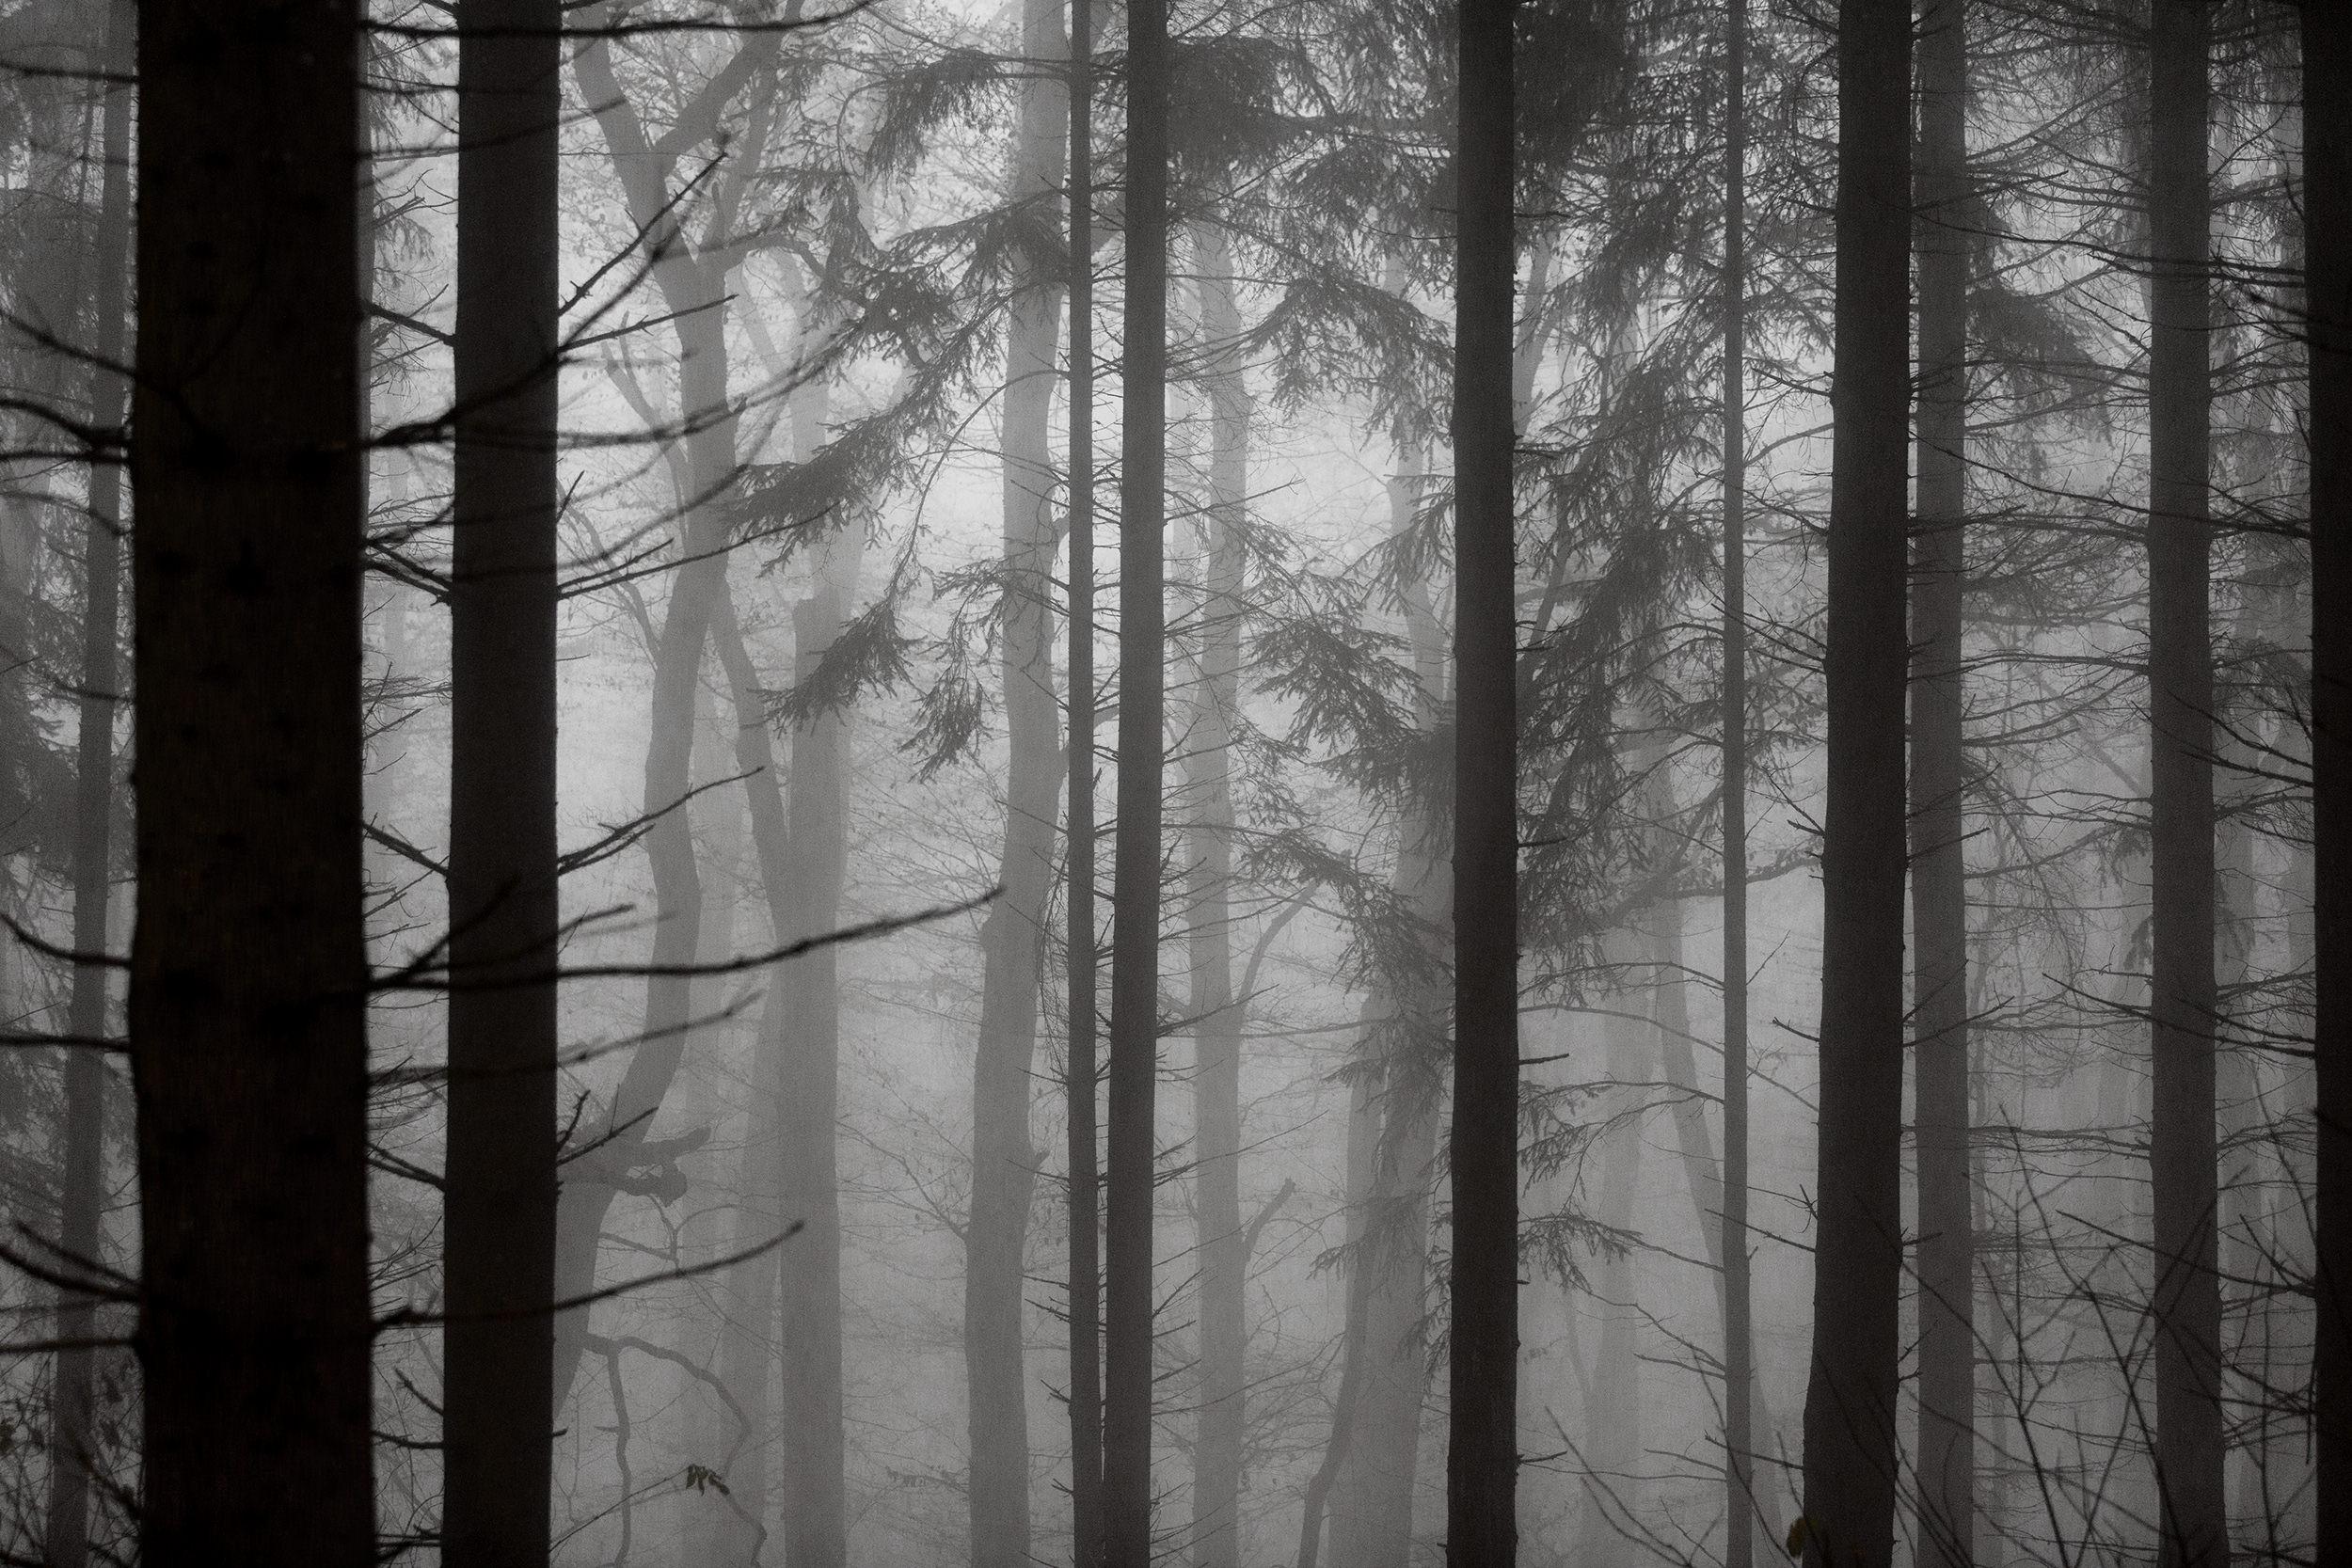 Bäume im dichten Nebel nahe der Salmendinger Kapelle.